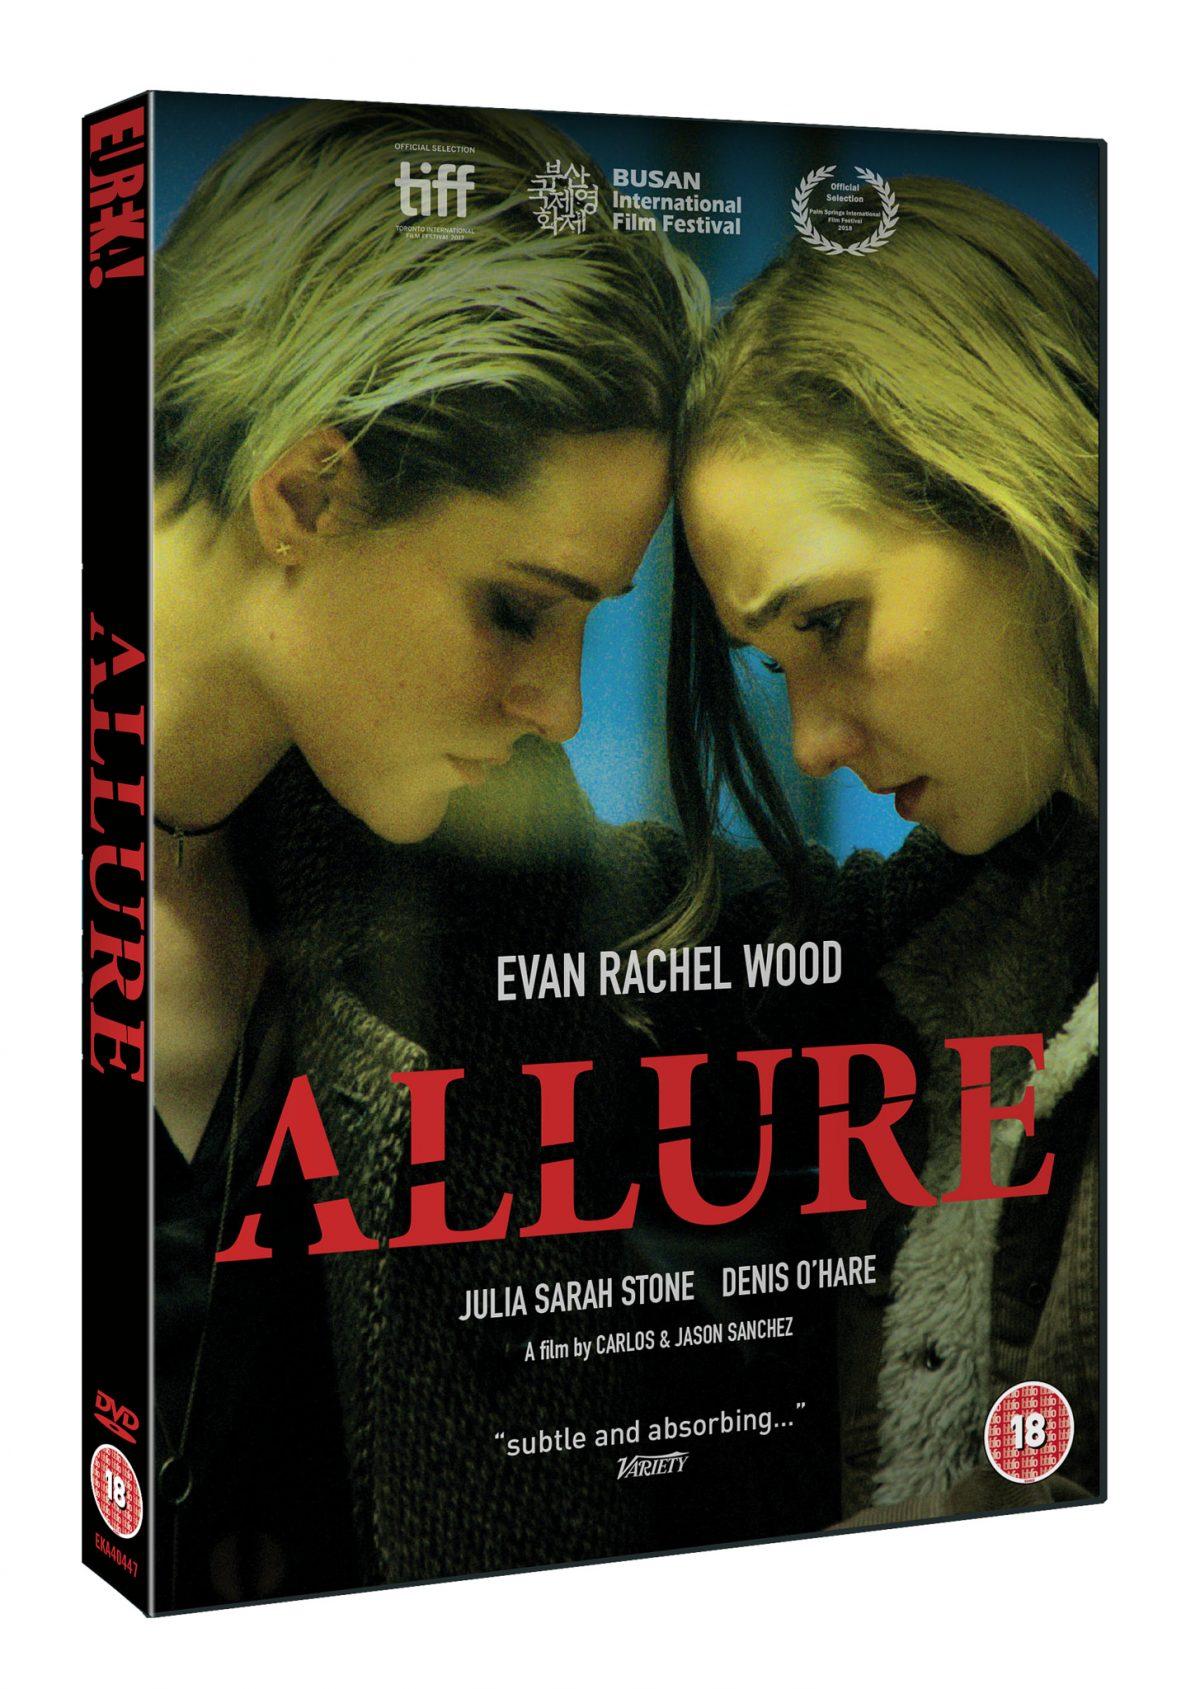 Win Allure starring #EvanRachelWood on DVD courtesy of #BlazingMinds and #EurekaEntertainment